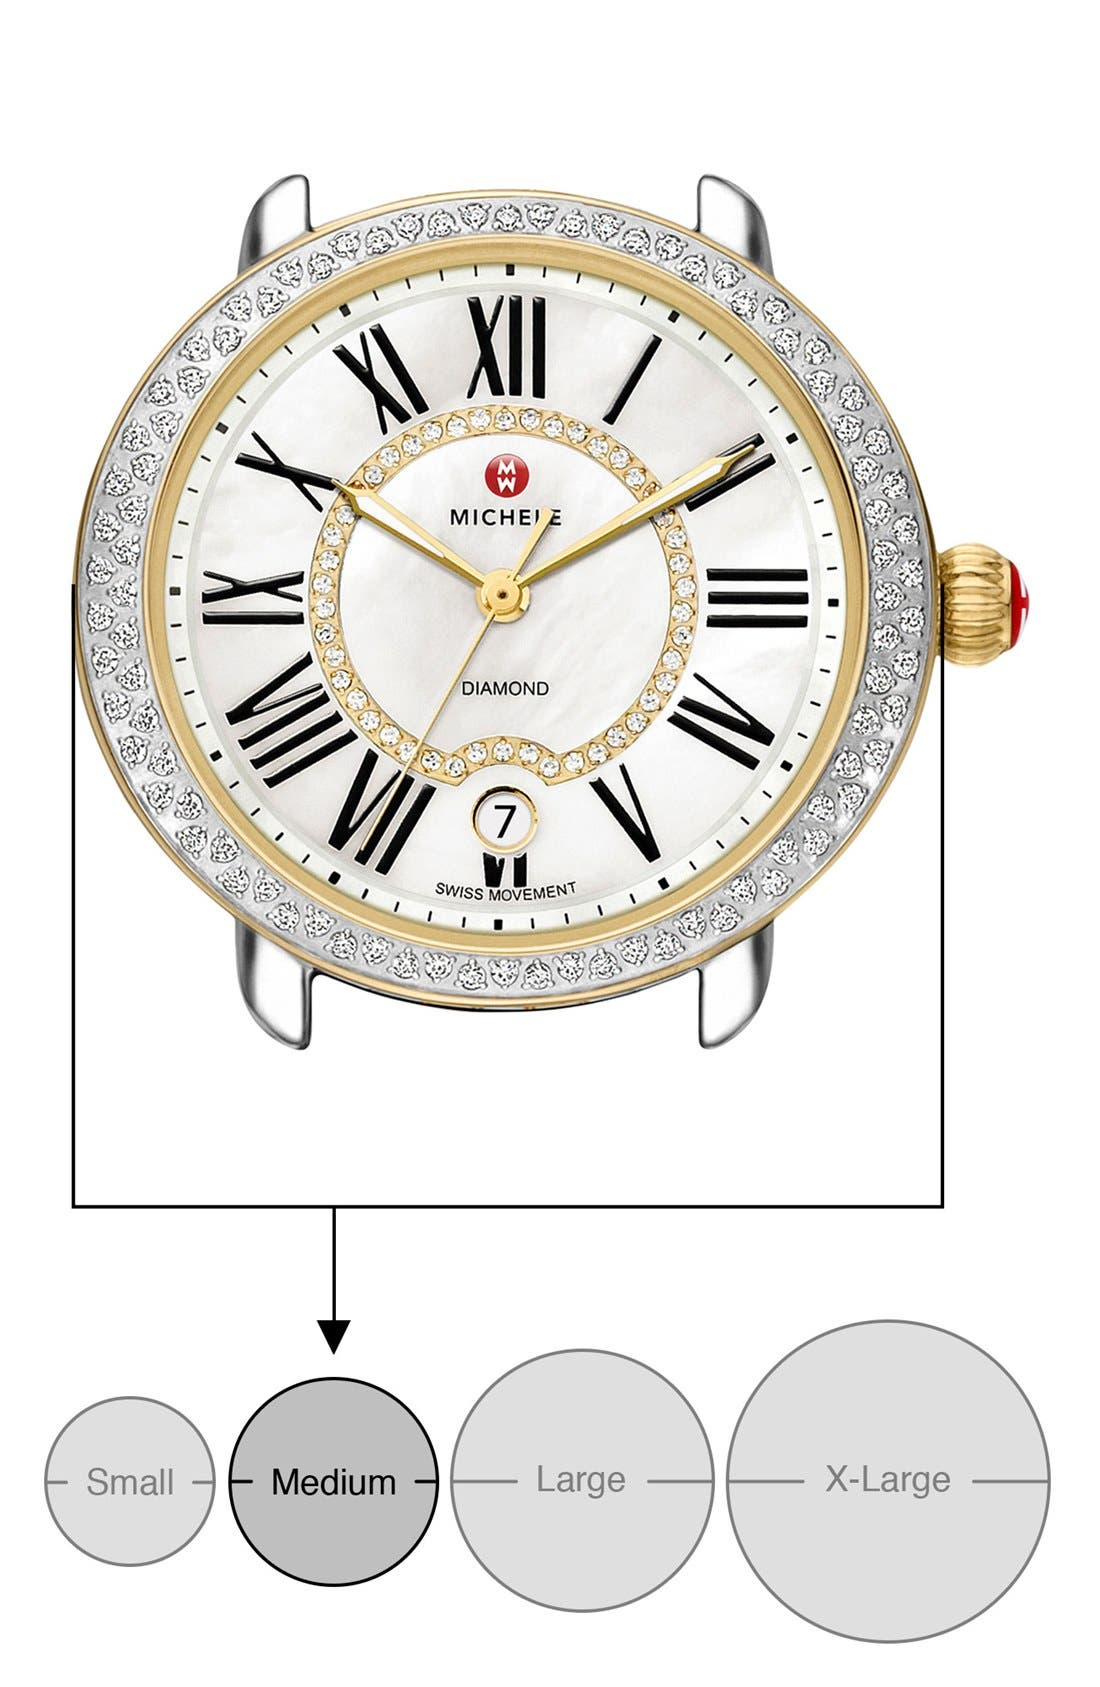 Serein 16 Diamond Watch Case, 34mm x 36mm,                             Alternate thumbnail 23, color,